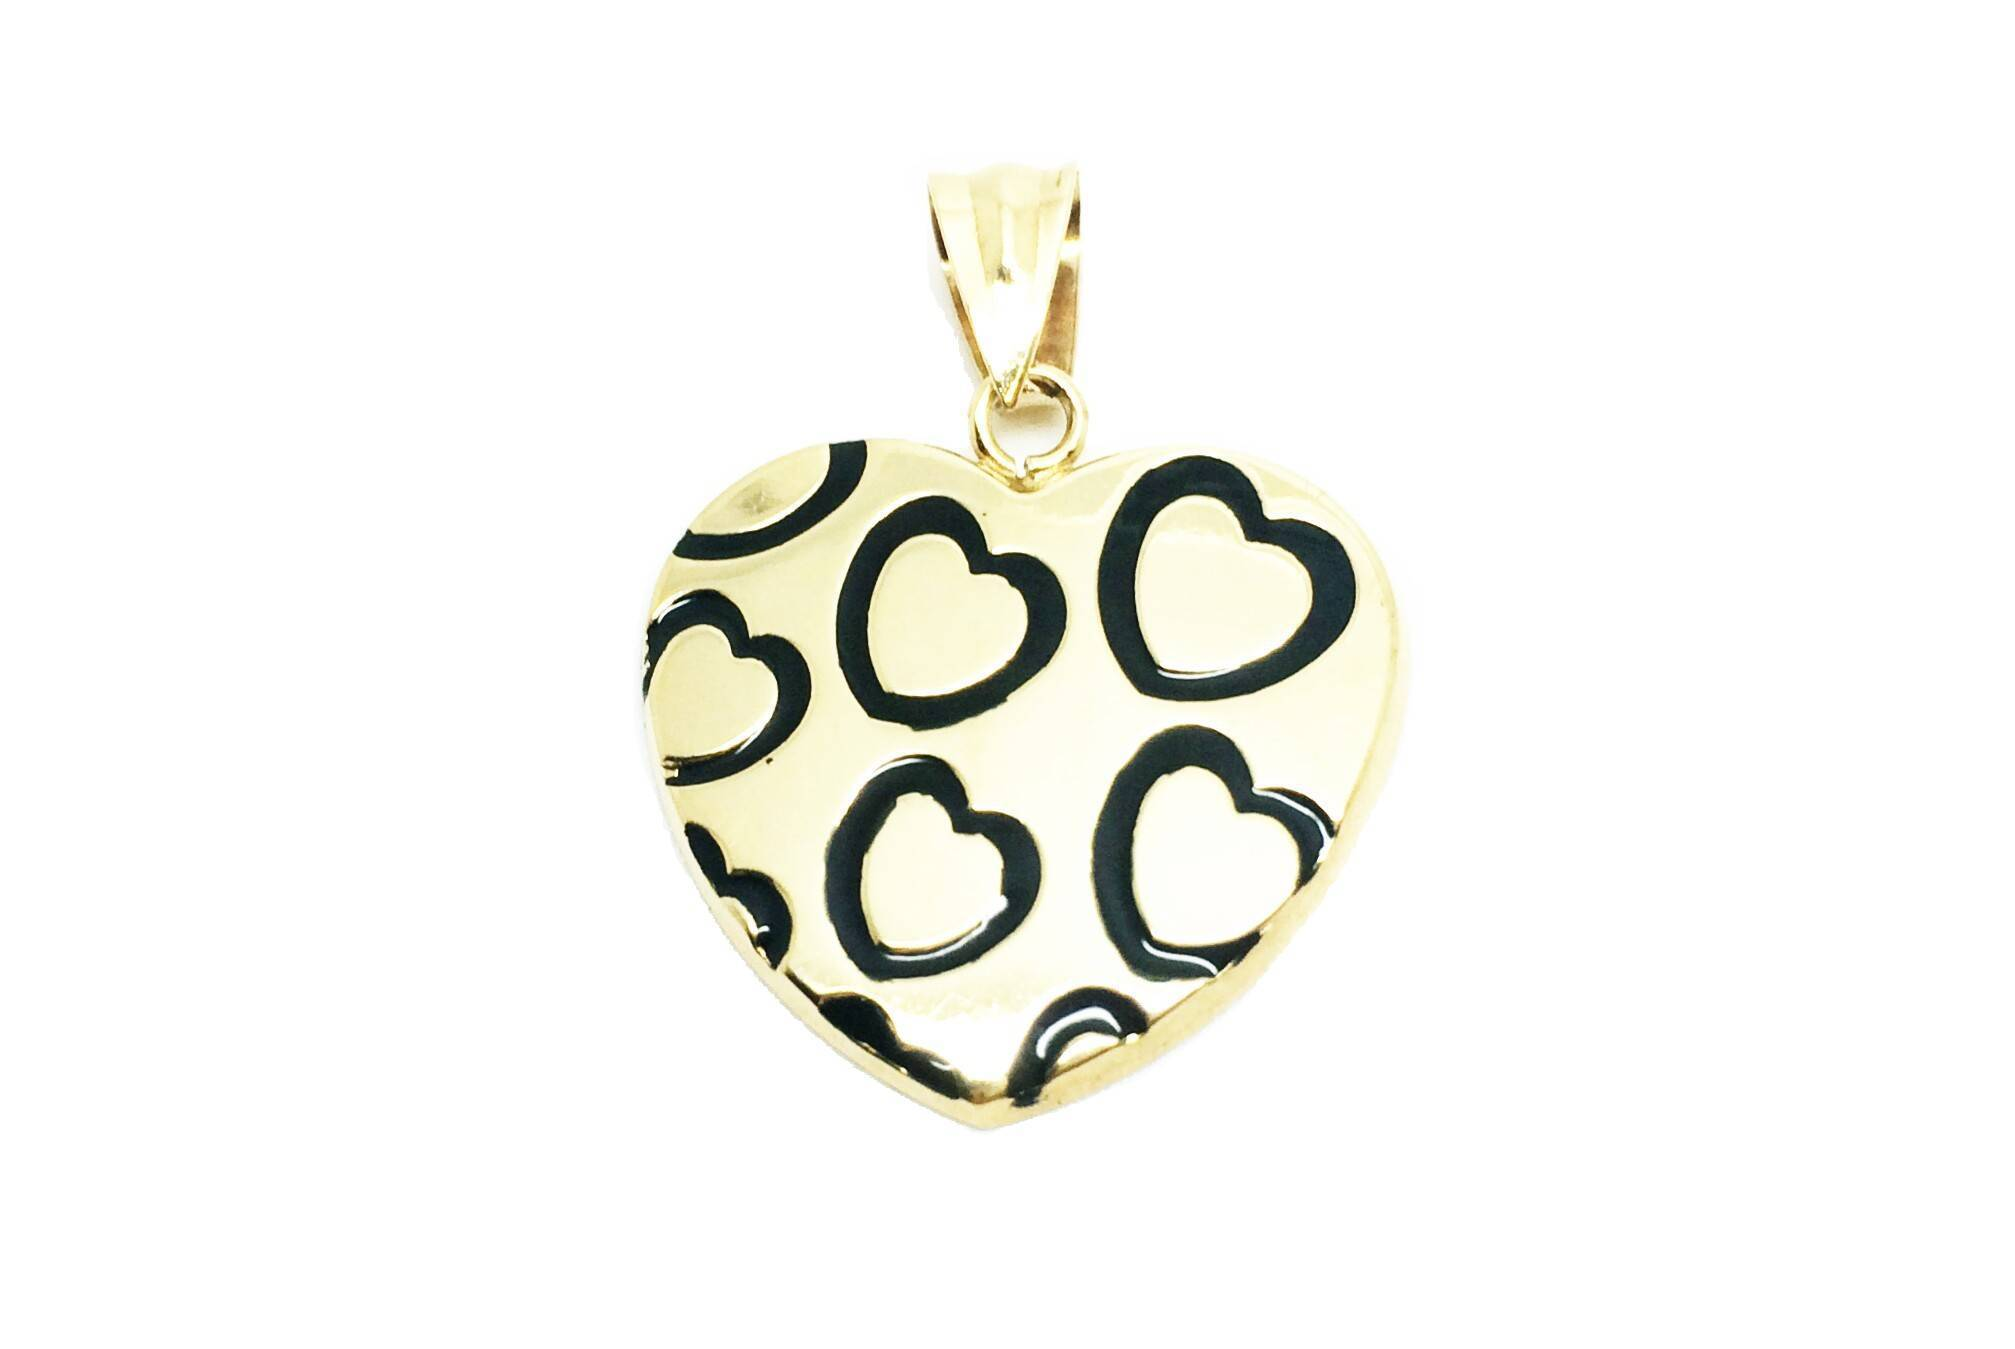 1f6a8b9cee29 Colgante de oro corazón san valentín amor Joyería Juan Luis Larráyoz  Pamplona comprar colgante corazón online